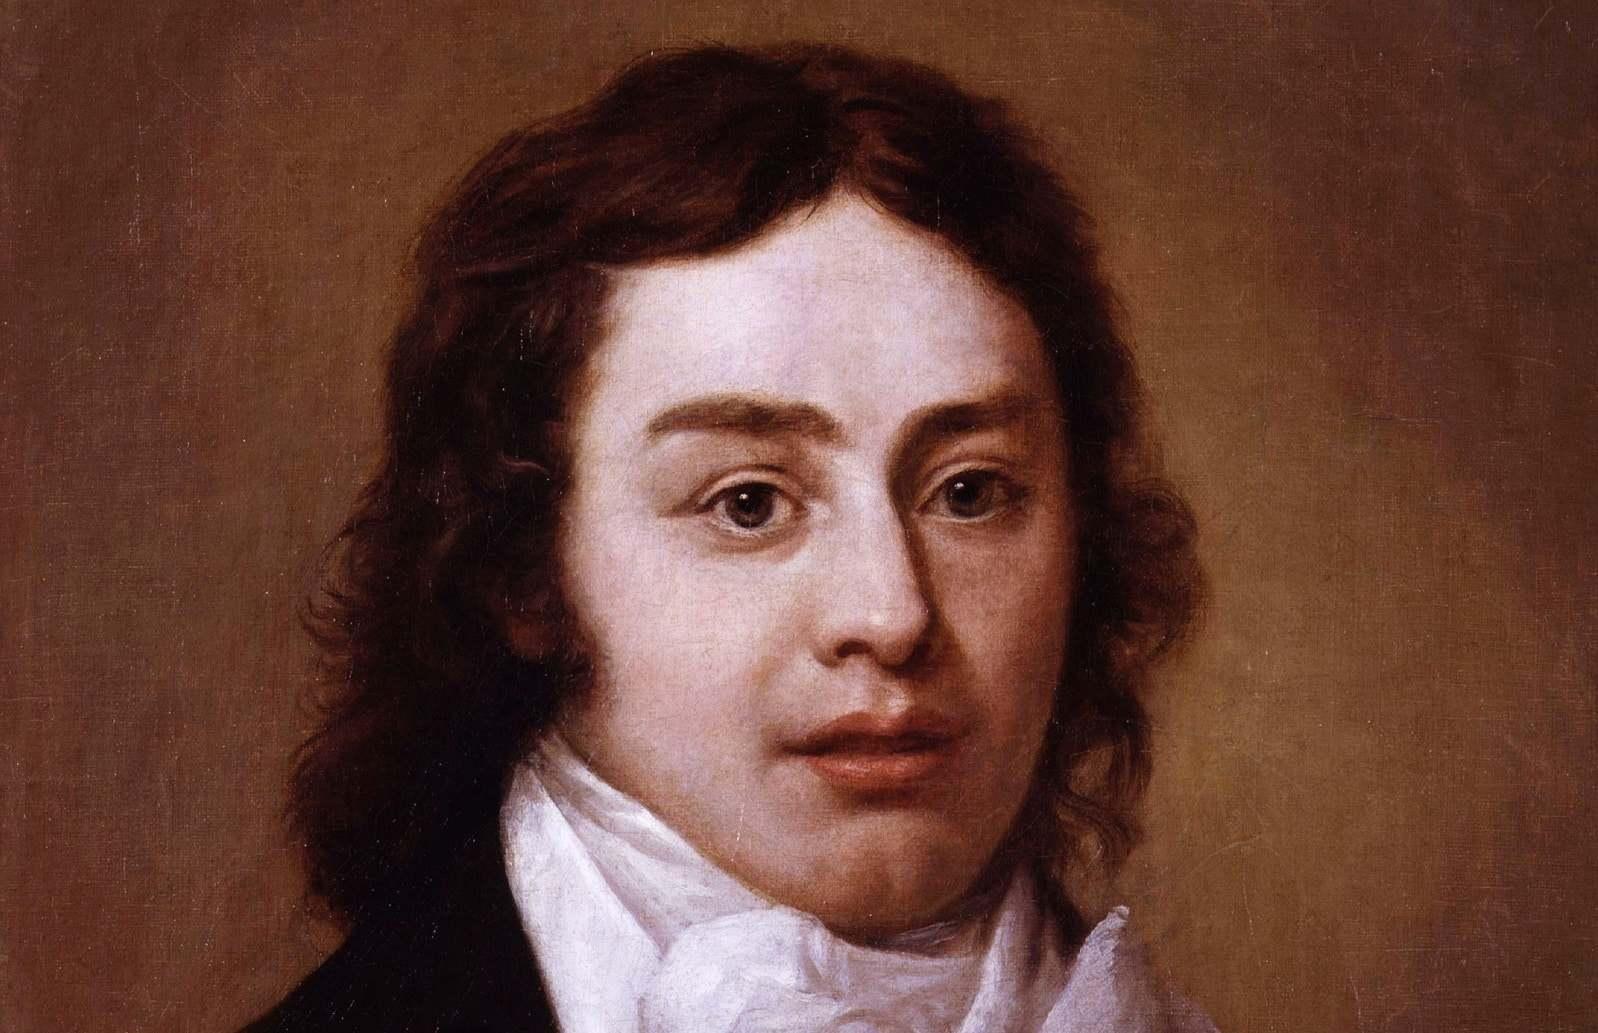 A portrait of Samuel Taylor Coleridge